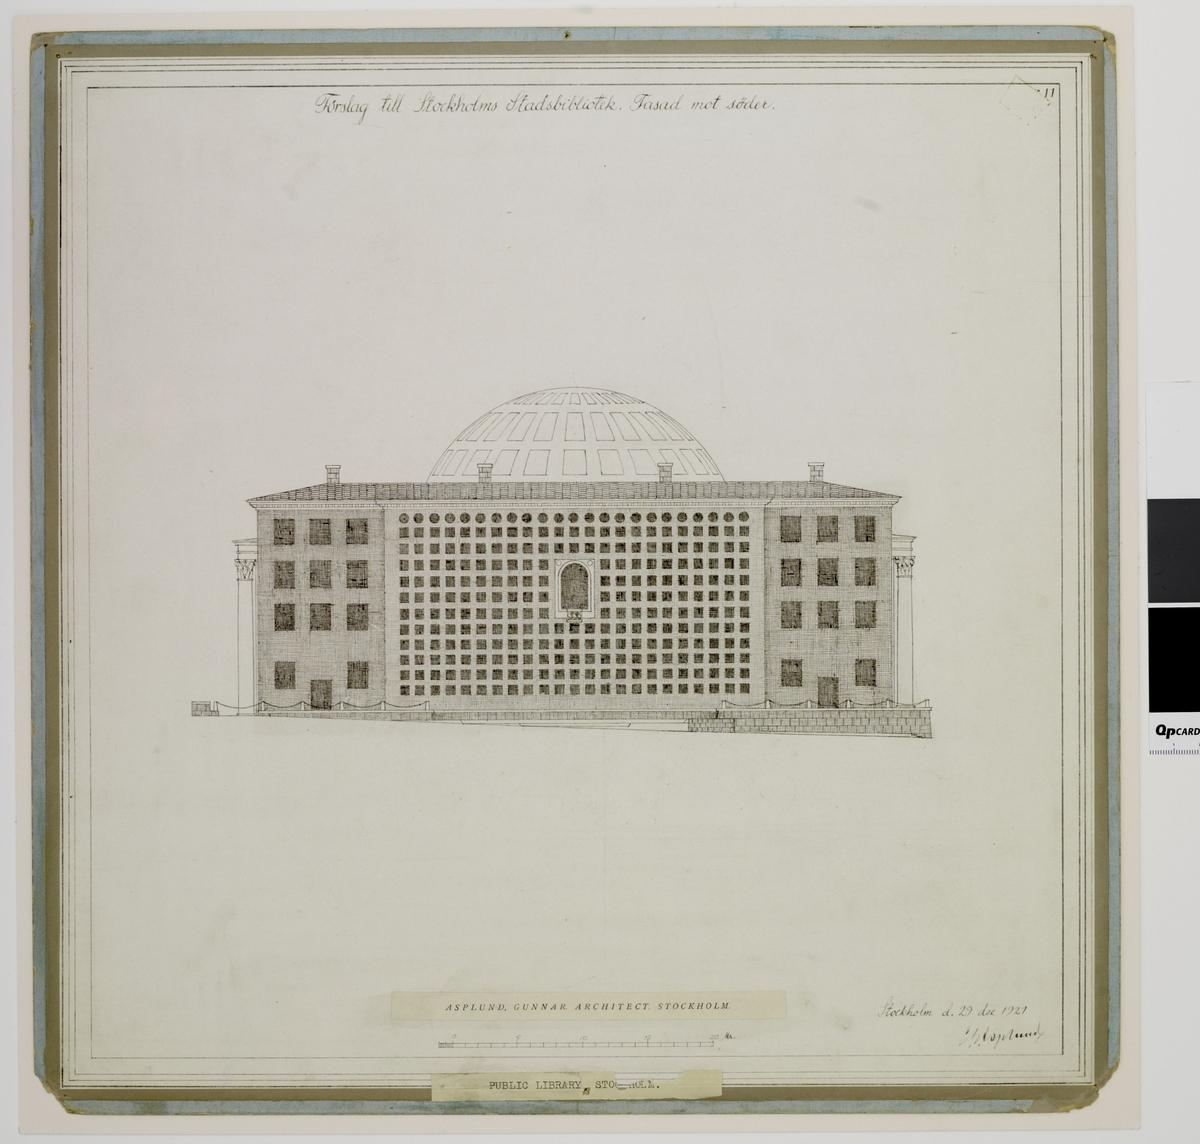 Stockholms stadsbibliotek Fasad